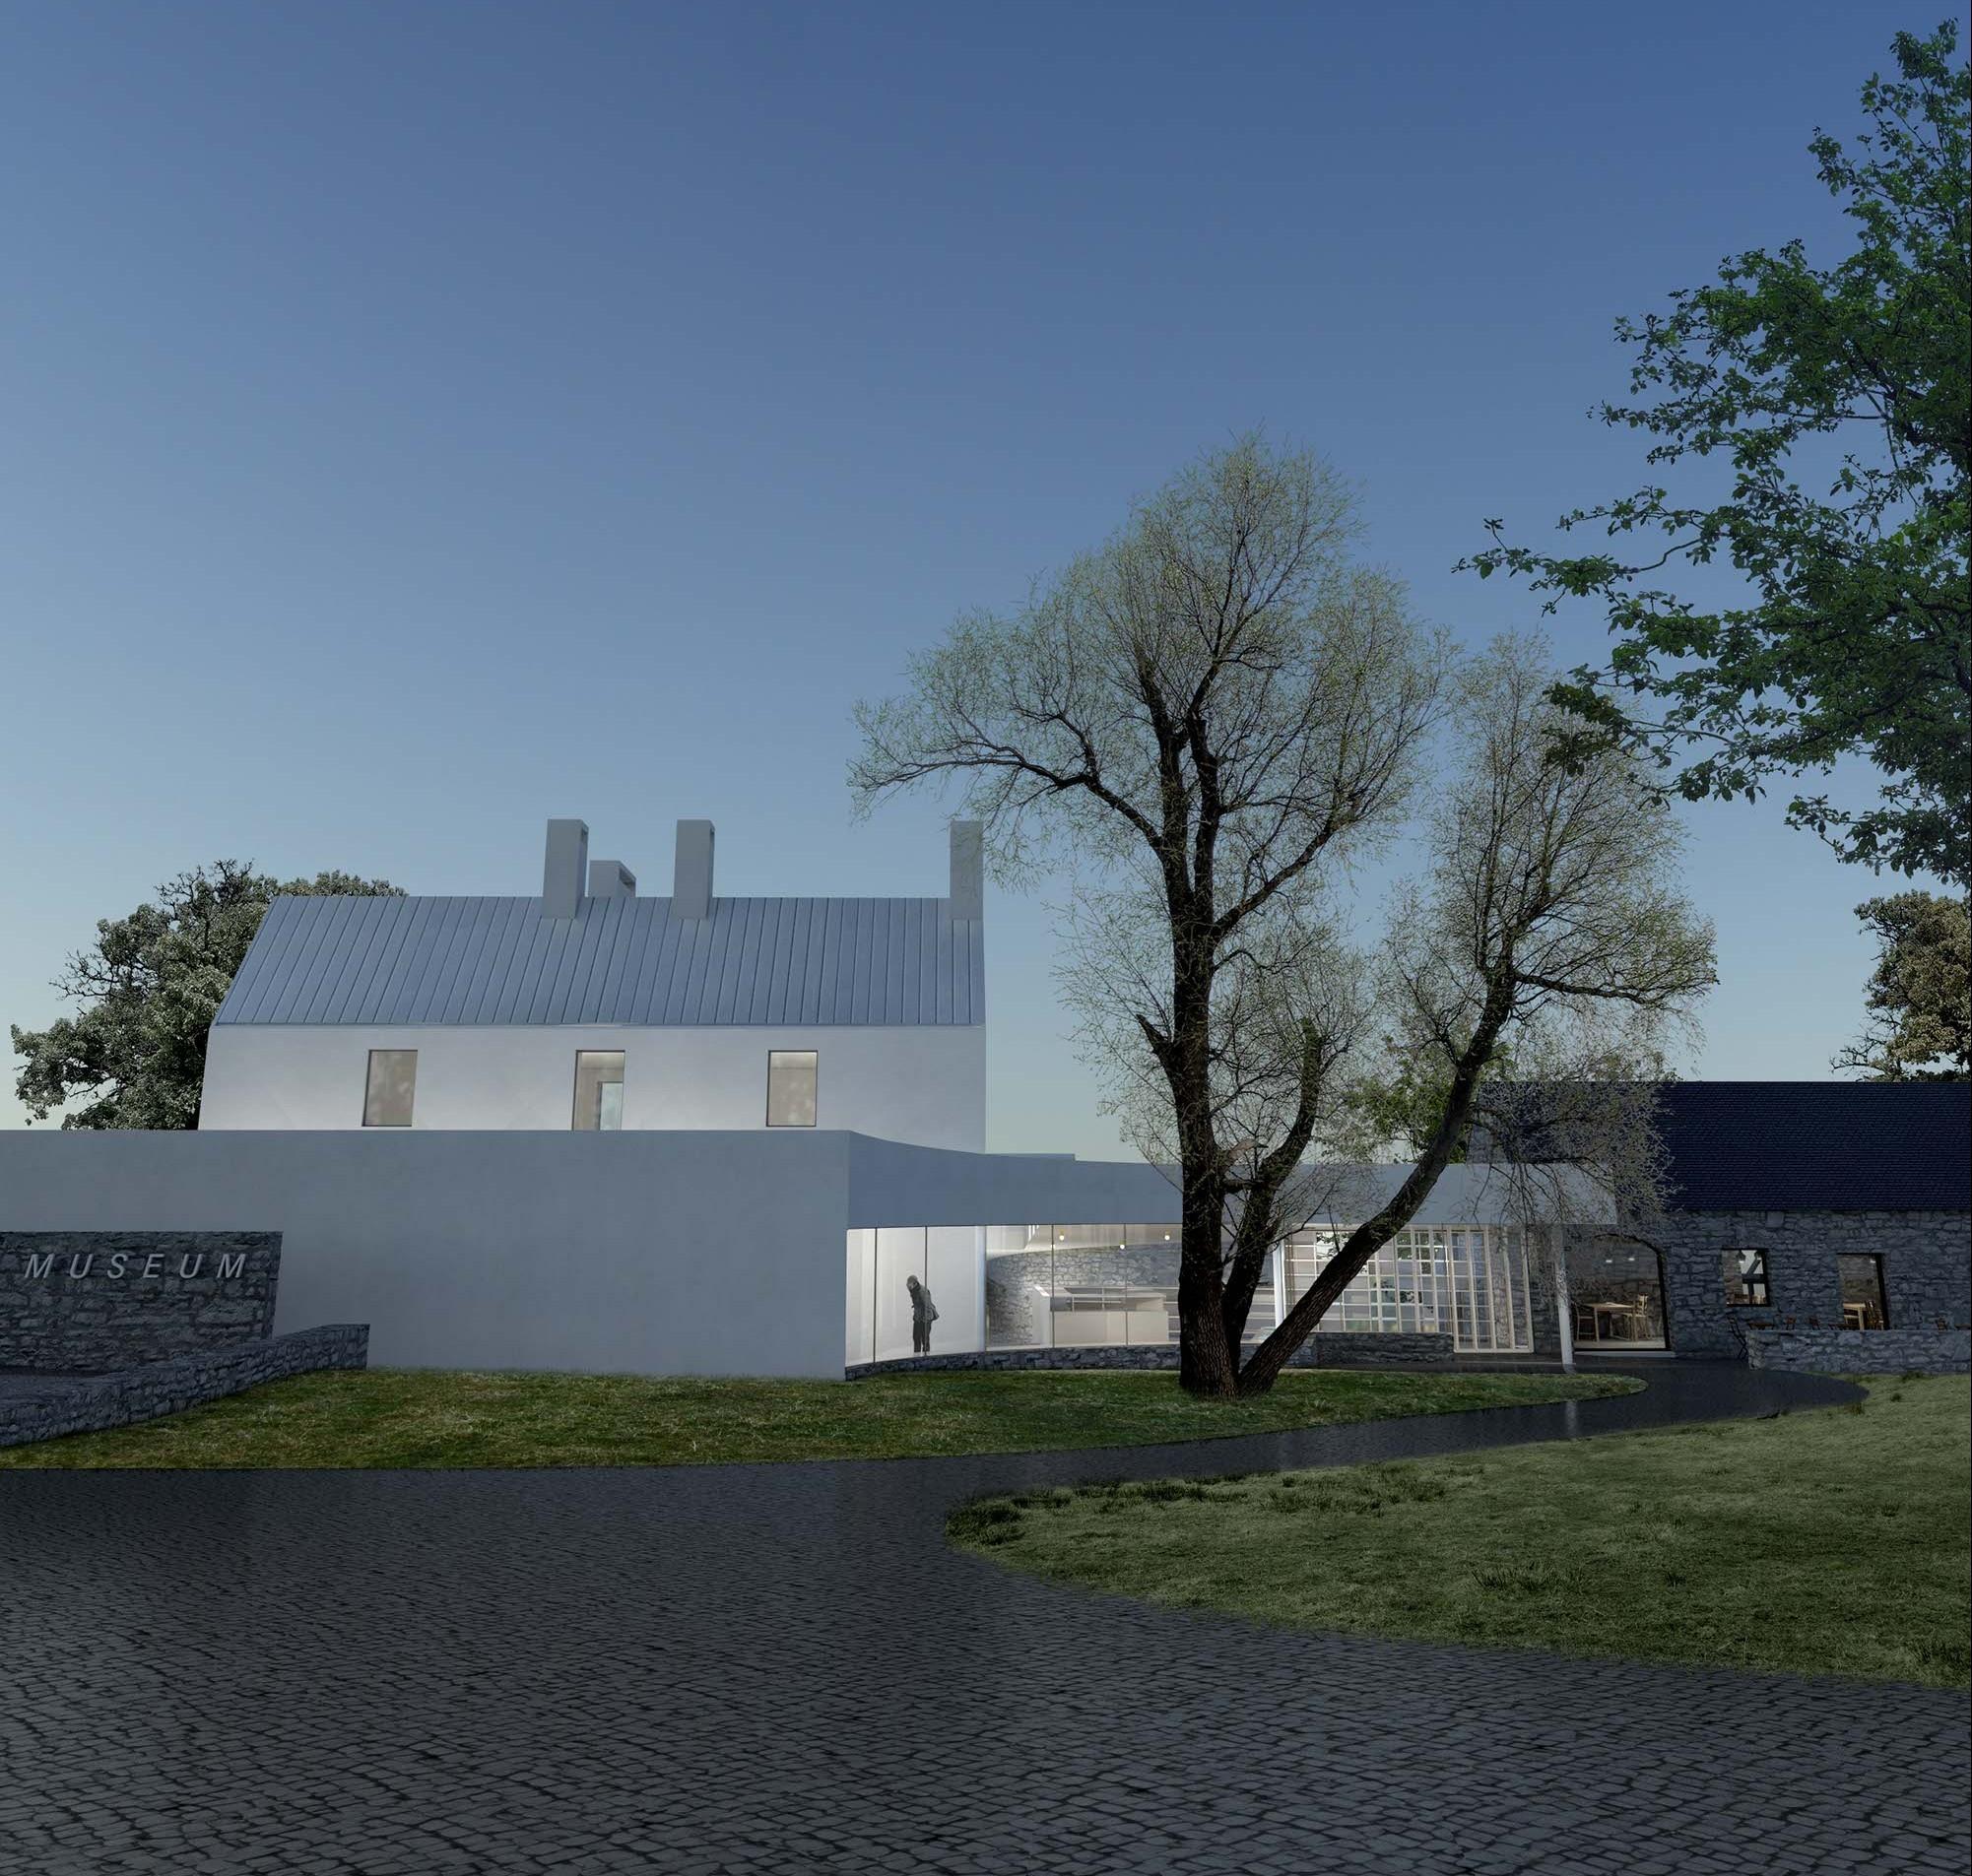 Artists impression of the Kilmartin Museum development